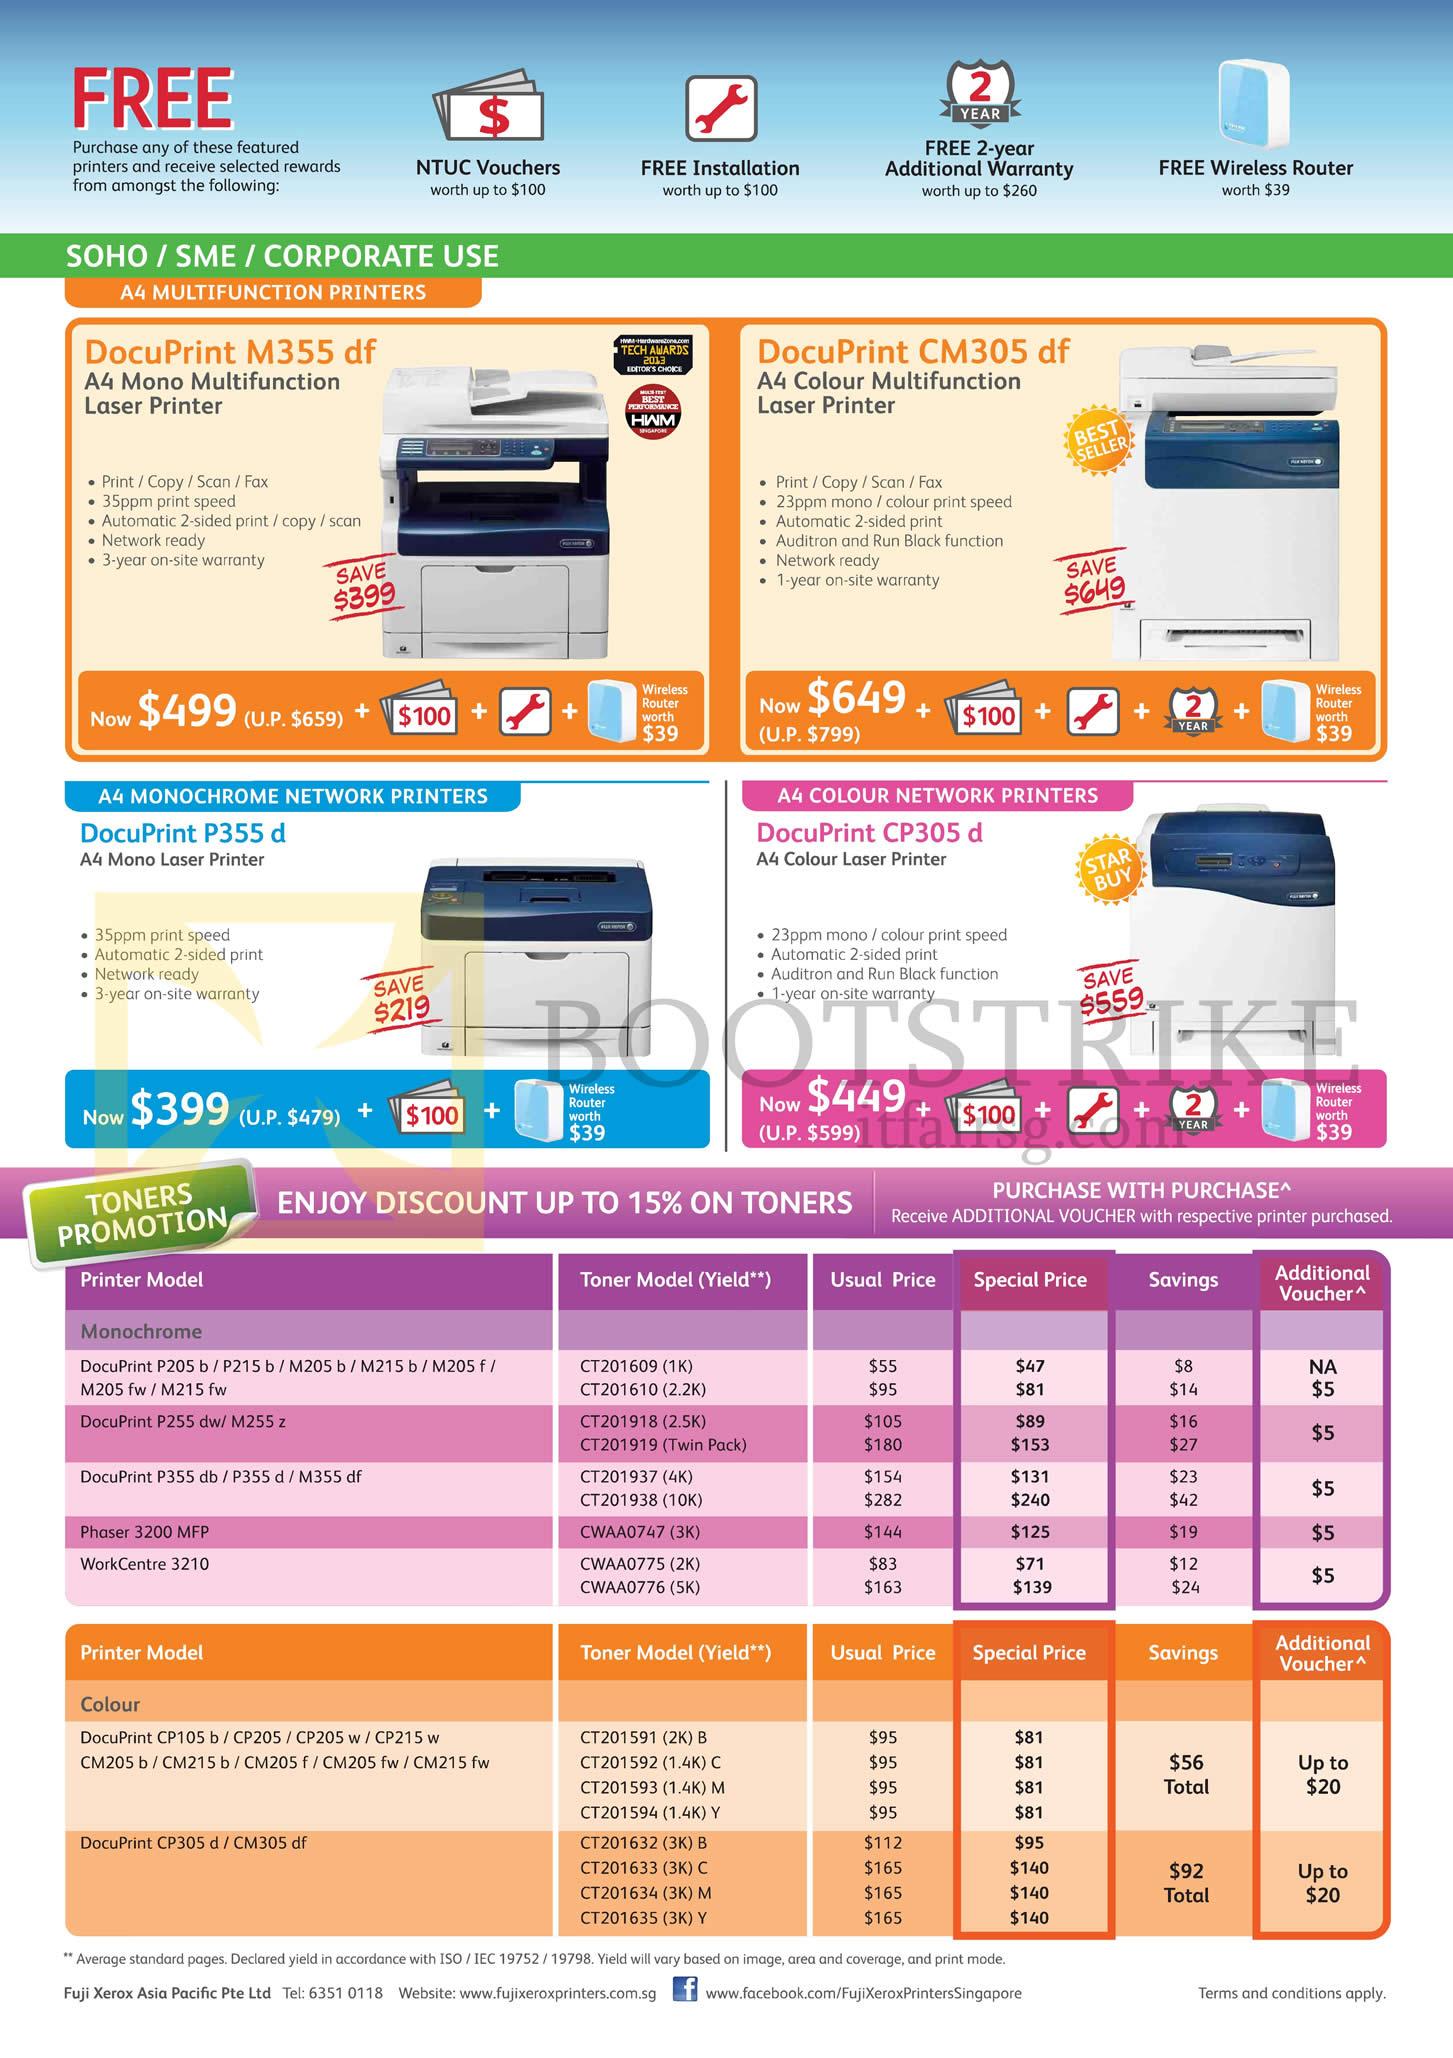 Fuji Xerox Printers Laser, Toners, DocuPrint M355df, CM305df, P355d